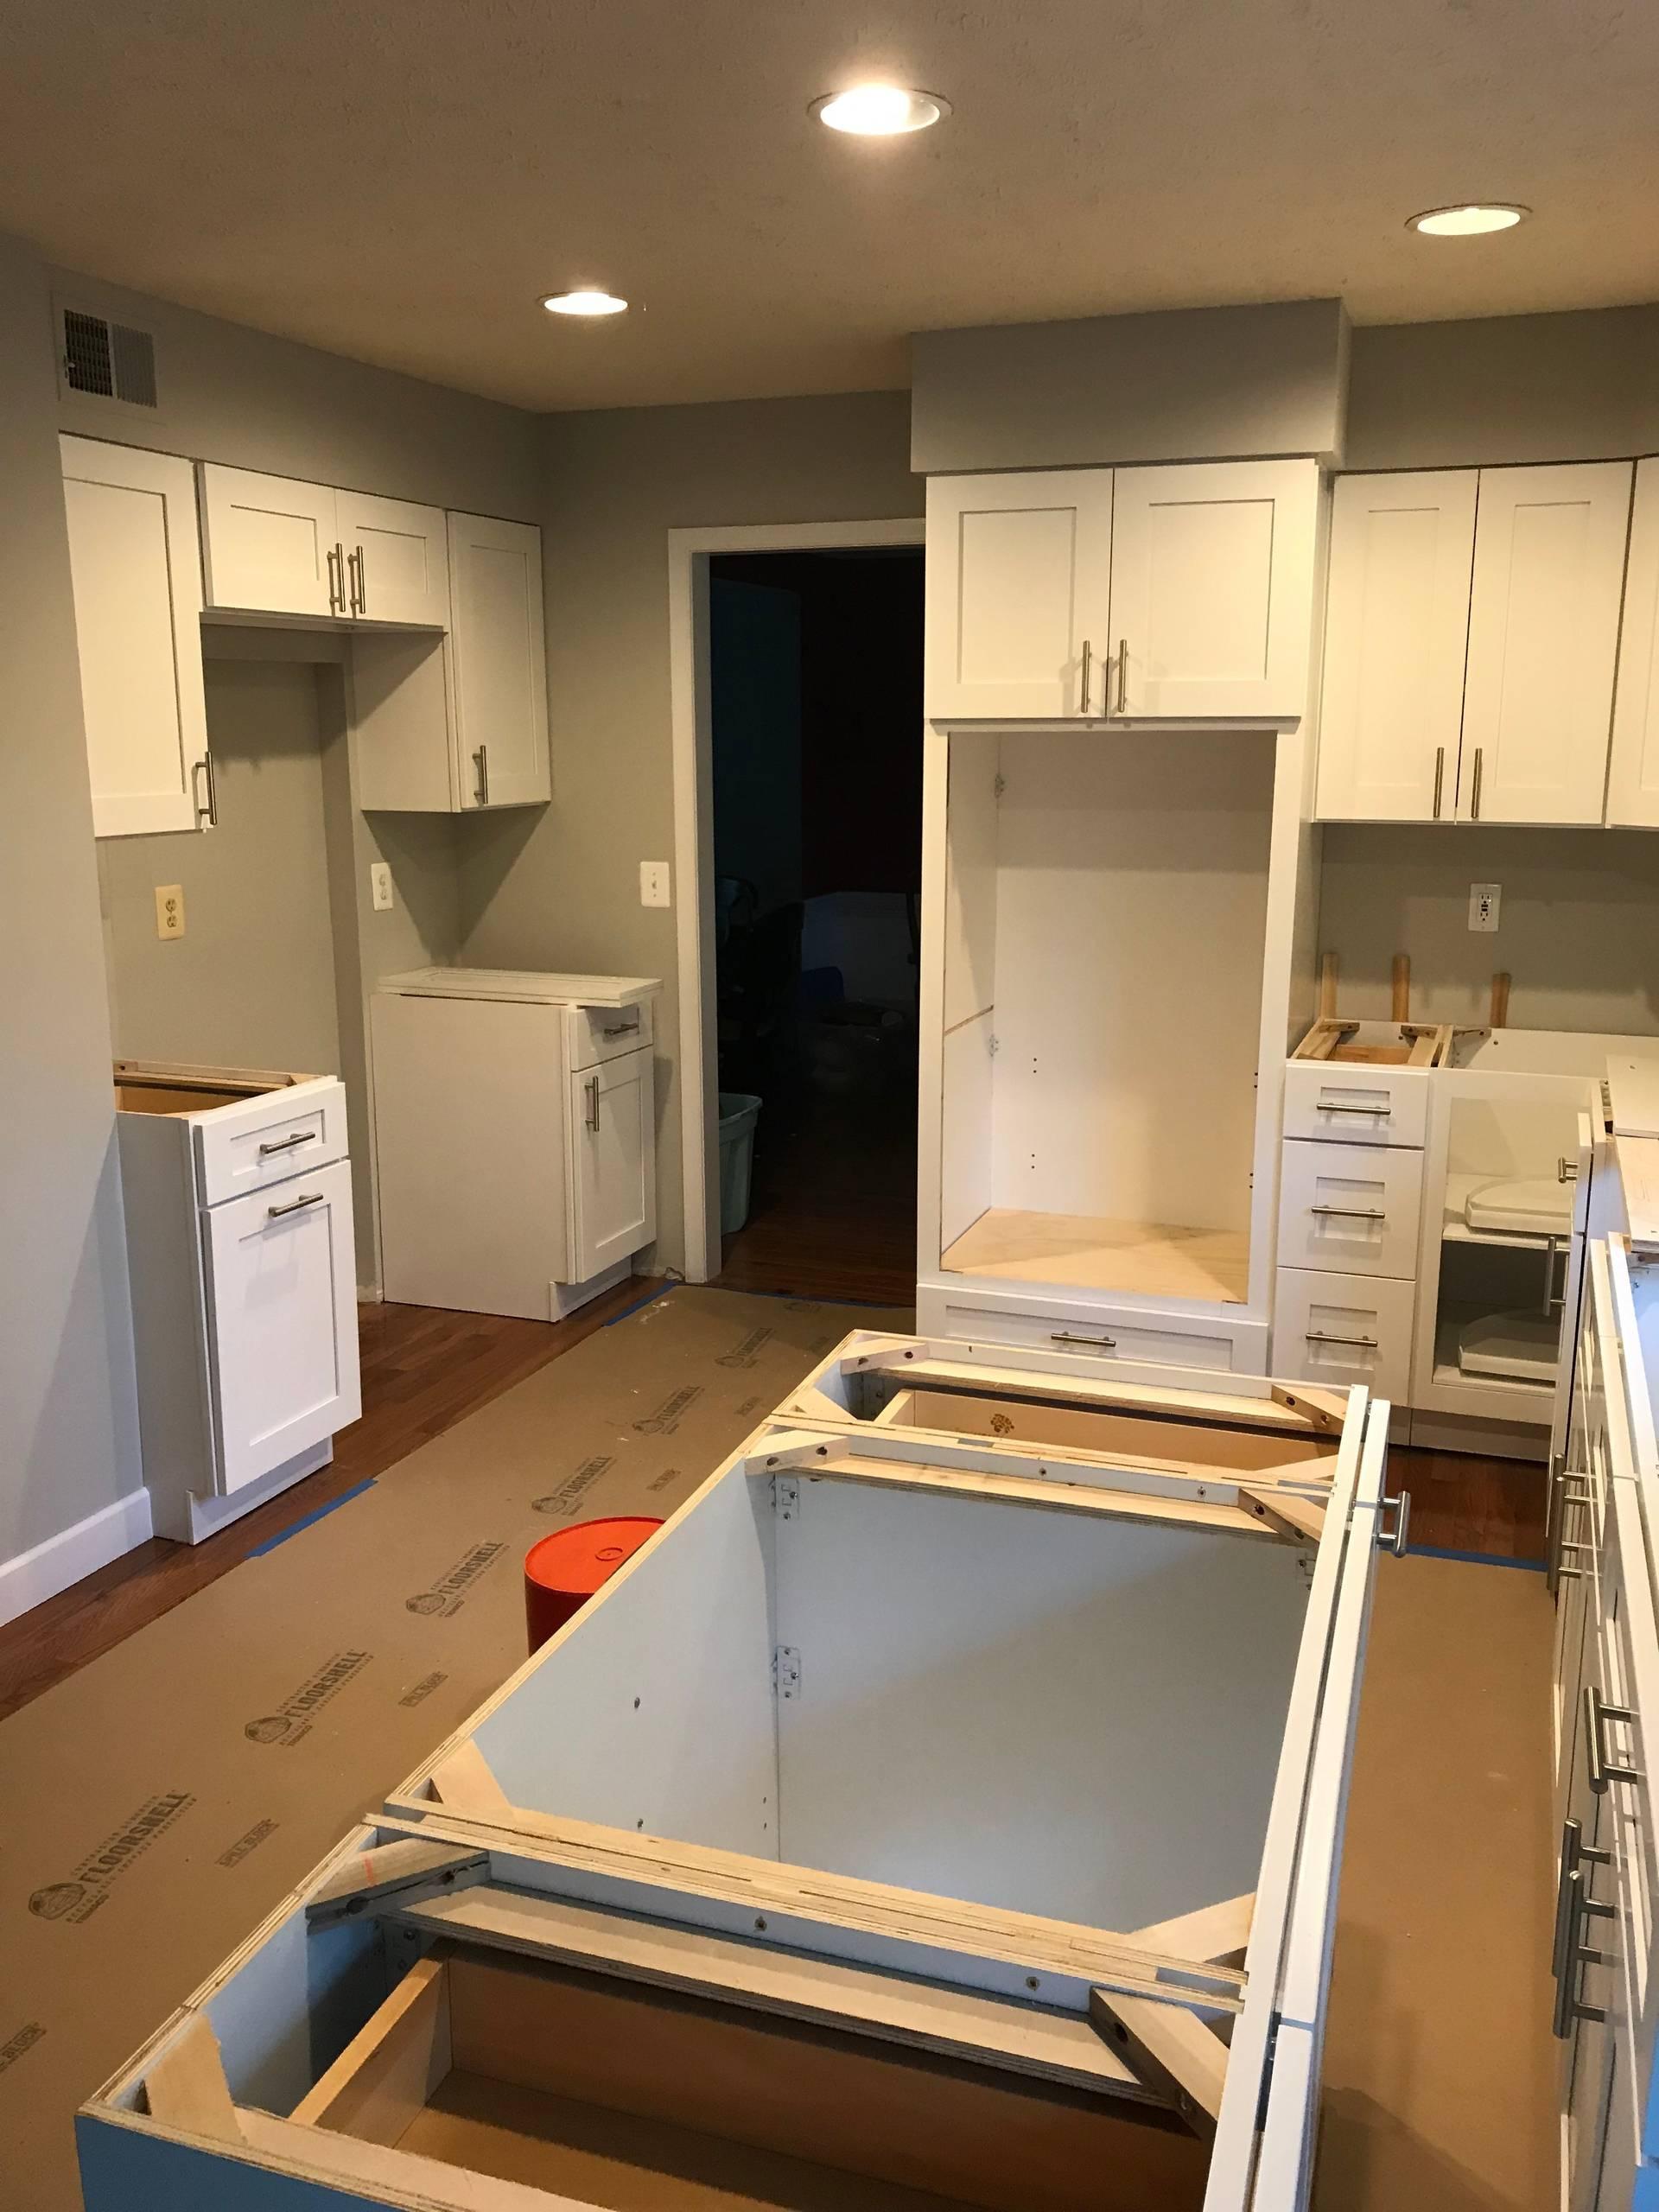 Crofton Kitchen Remodel